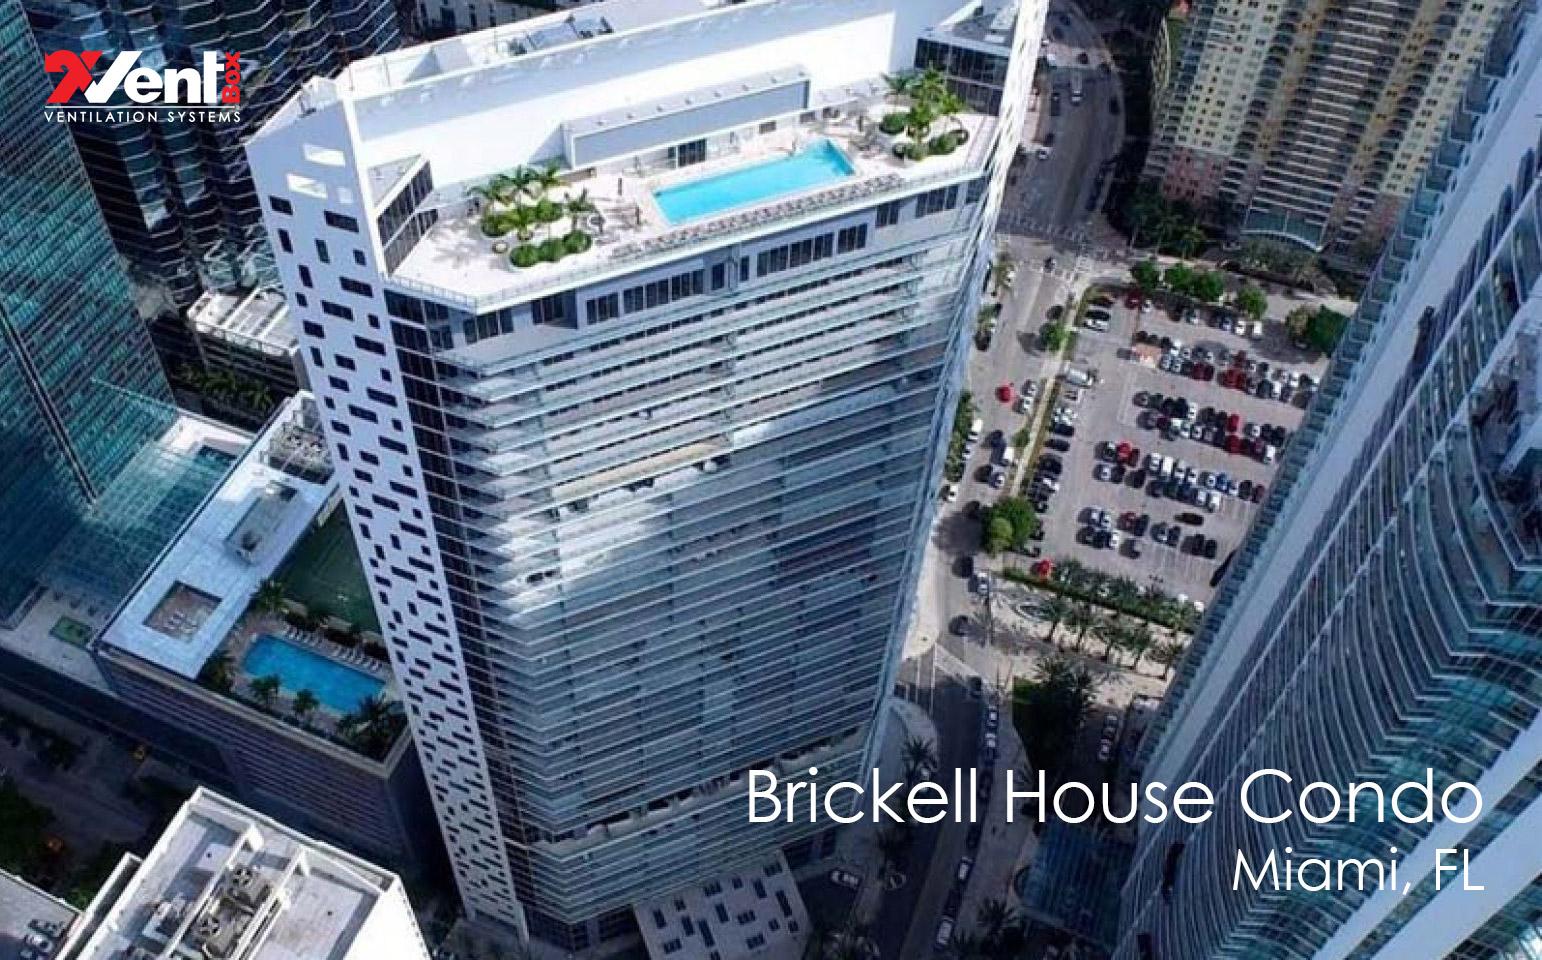 Brickell House Condo